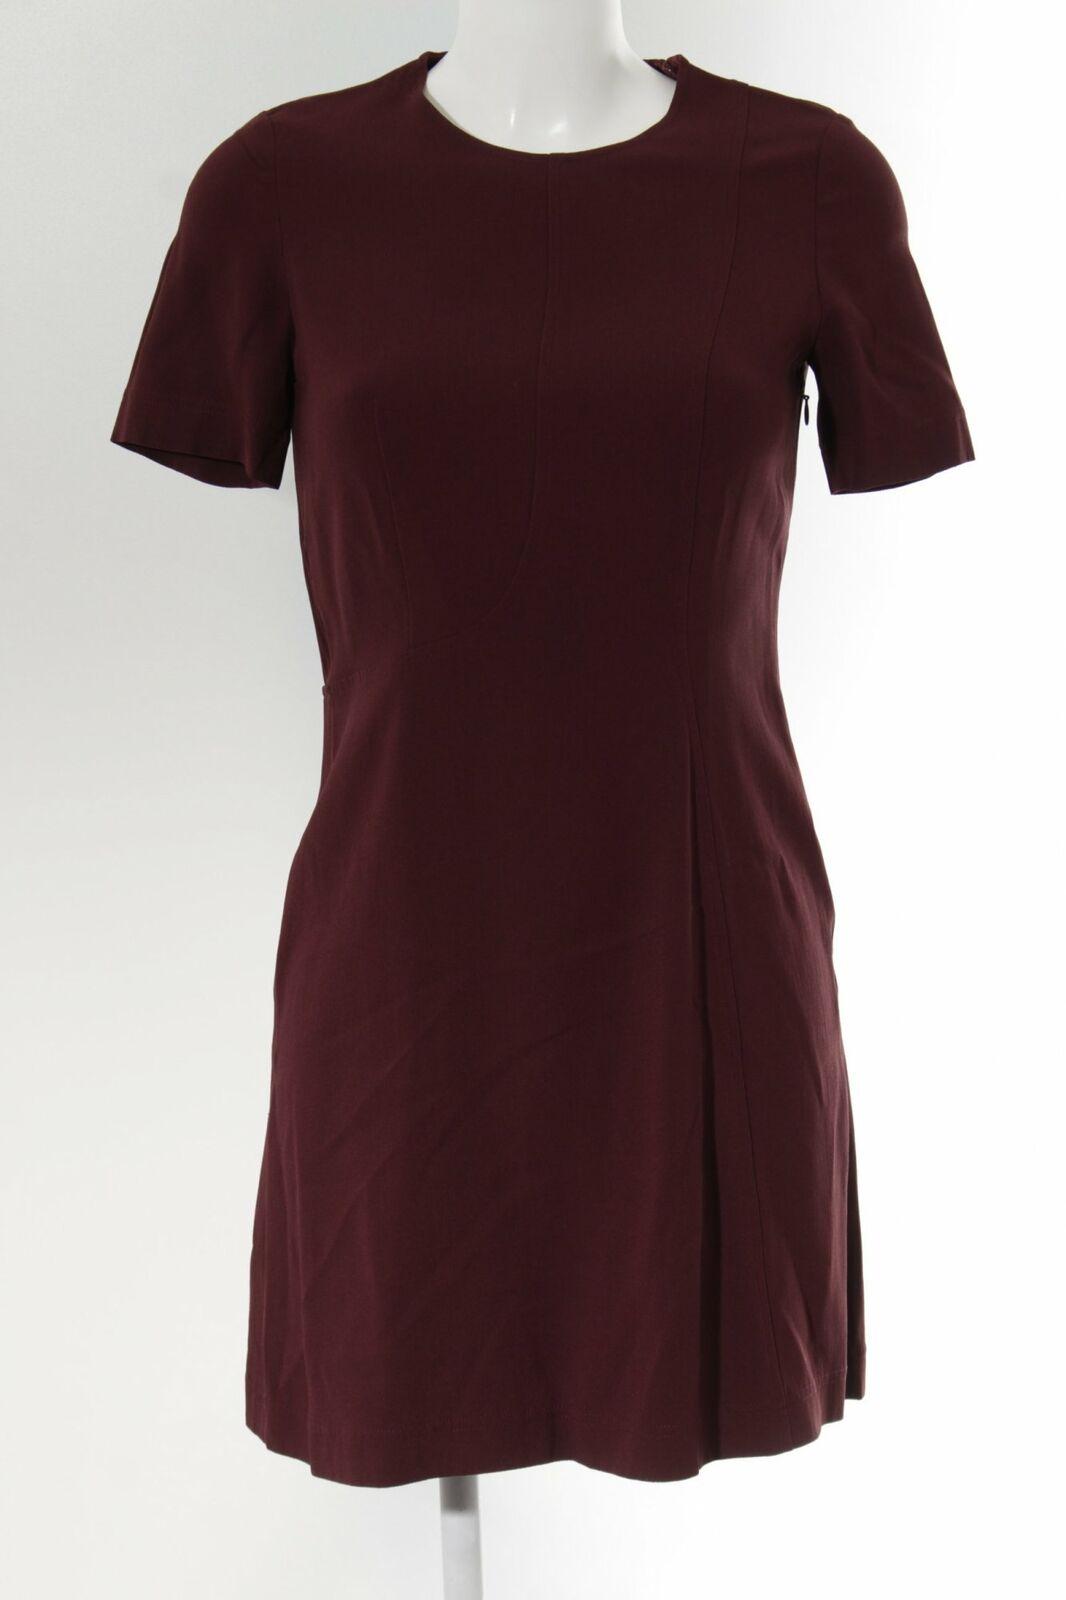 CéDRIC CHARLIER Kurzarmkleid bordeauxrot Elegant Damen Gr. DE 38 Kleid Dress